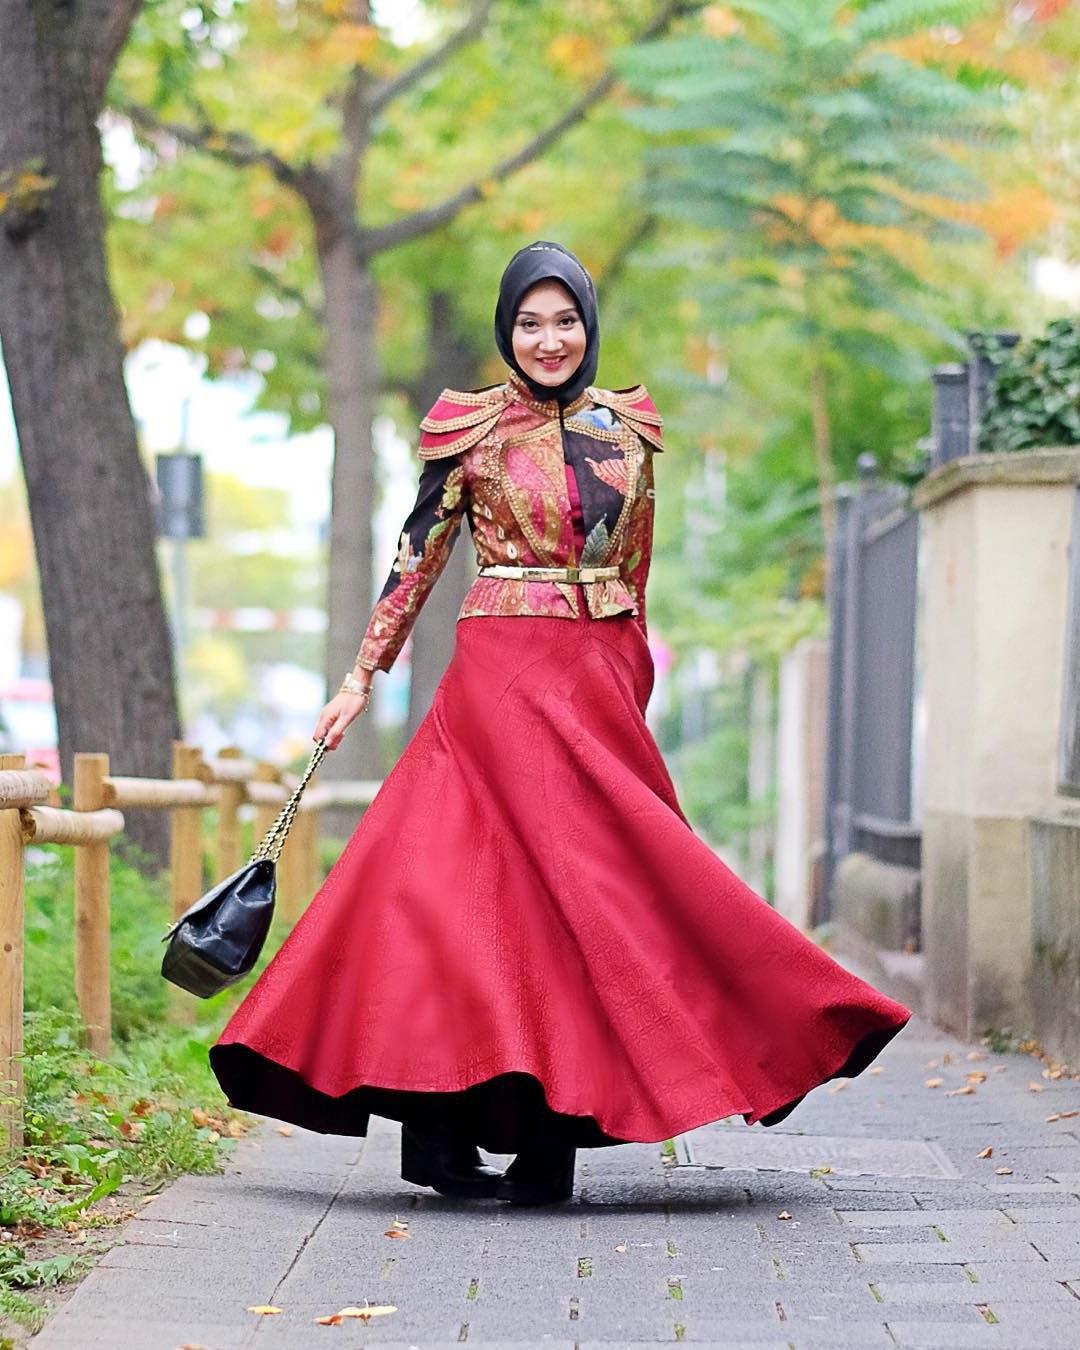 Inspirasi Model Baju Lebaran Dian Pelangi 2017 Whdr Pilihan Model Baju Hijab Dian Pelangi Terbaru 2016